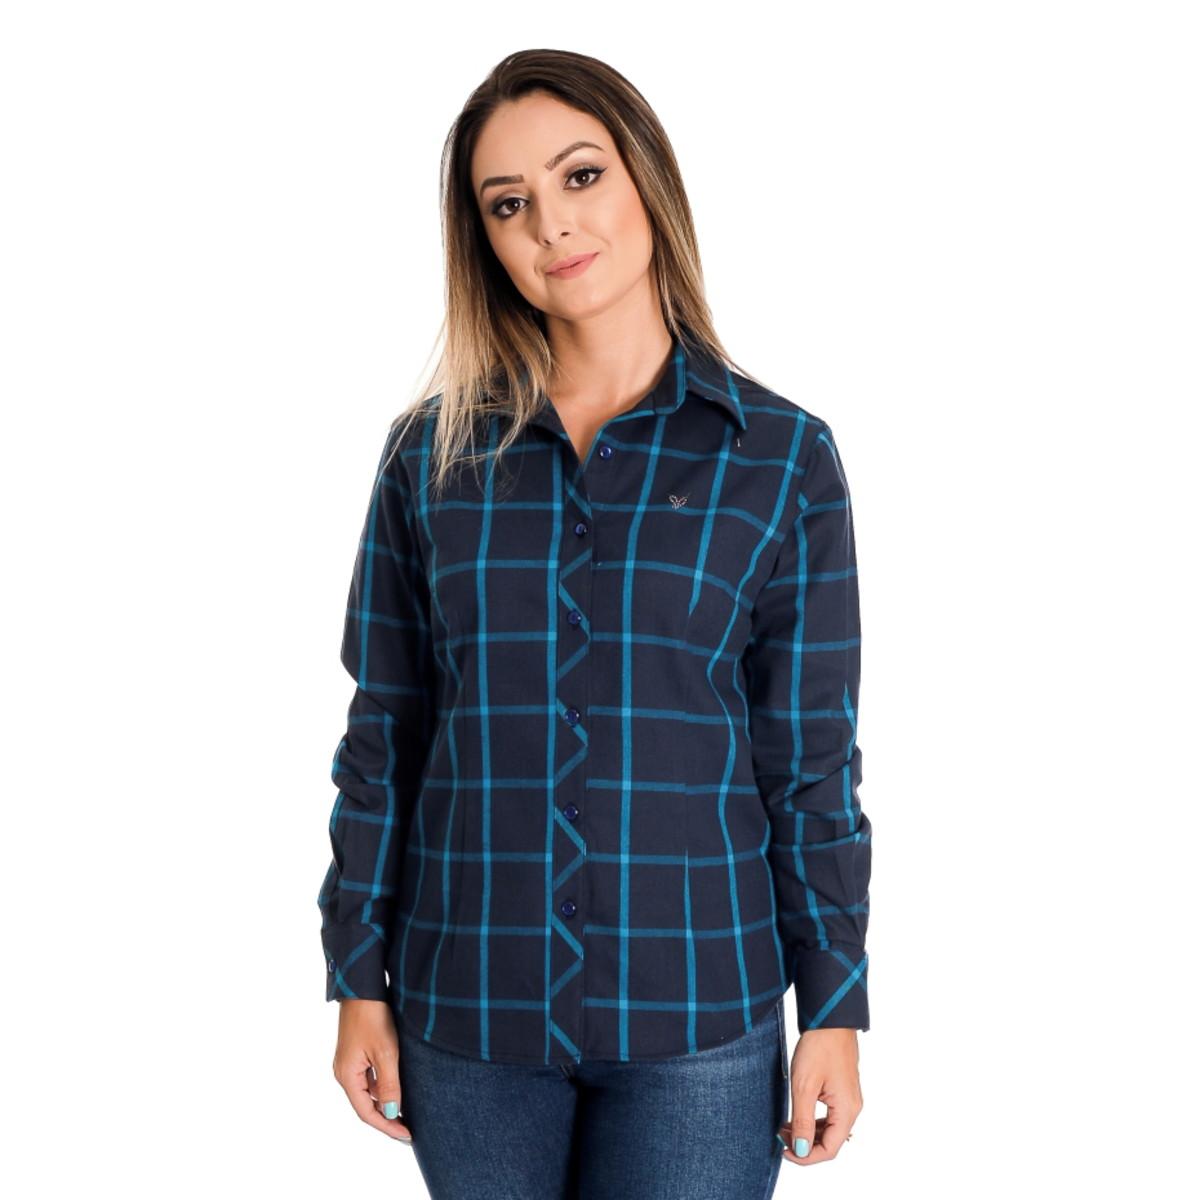 079d18a18 Camisa Feminina Xadrez Giullia - Pimenta Rosada no Elo7 | Pimenta ...